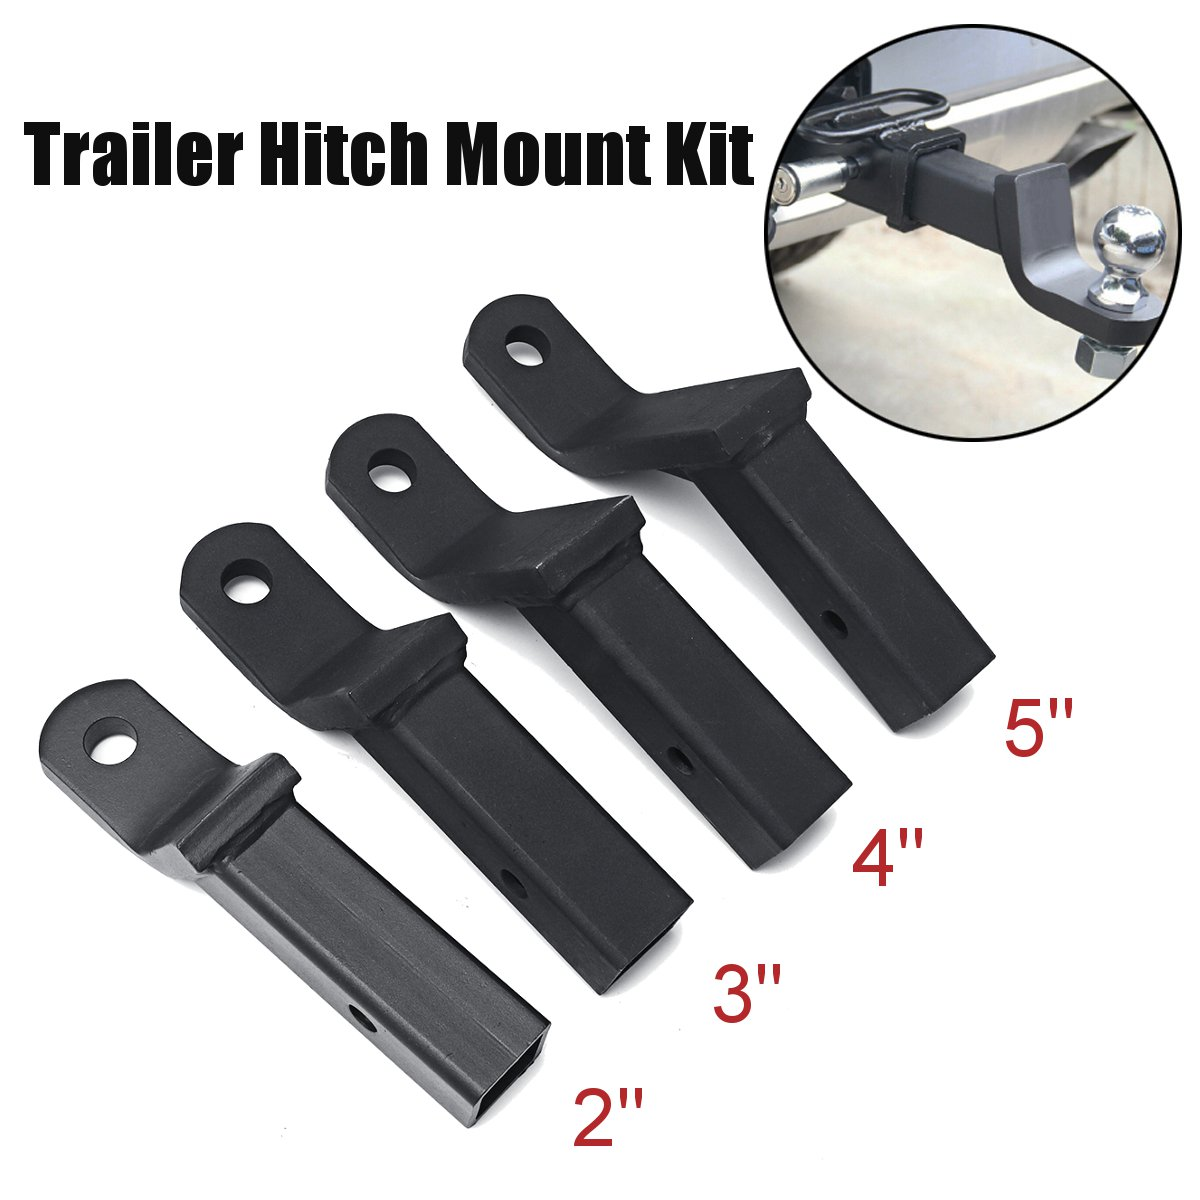 "Steel Truck Trailer Hook Folding Trailer Hitch Mount Shank Adapter Cargo Wheelchair Carrier 2""/3 Car Trailer Parts Connector"